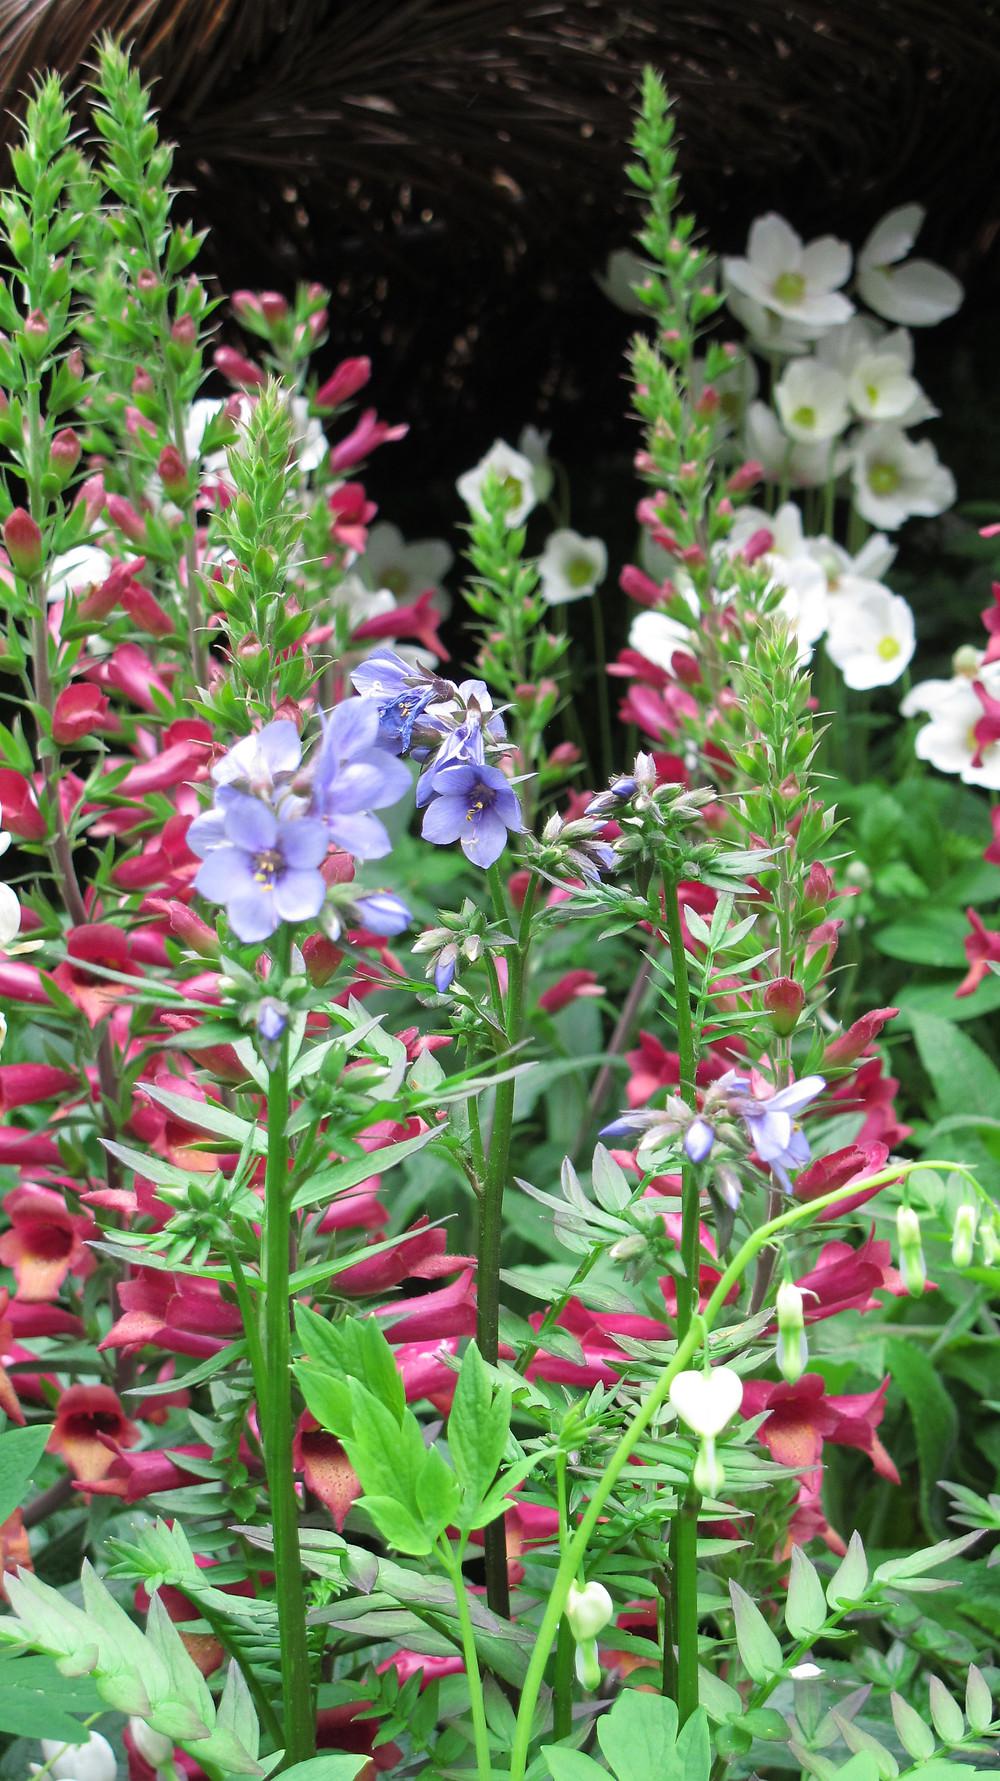 chelsea flower show, Landscape architect, Sarah Eberle, Breast Cancer, Haven Garden, RHS Chelsea, Tom Hare, willow woven oak leaf 'nest'